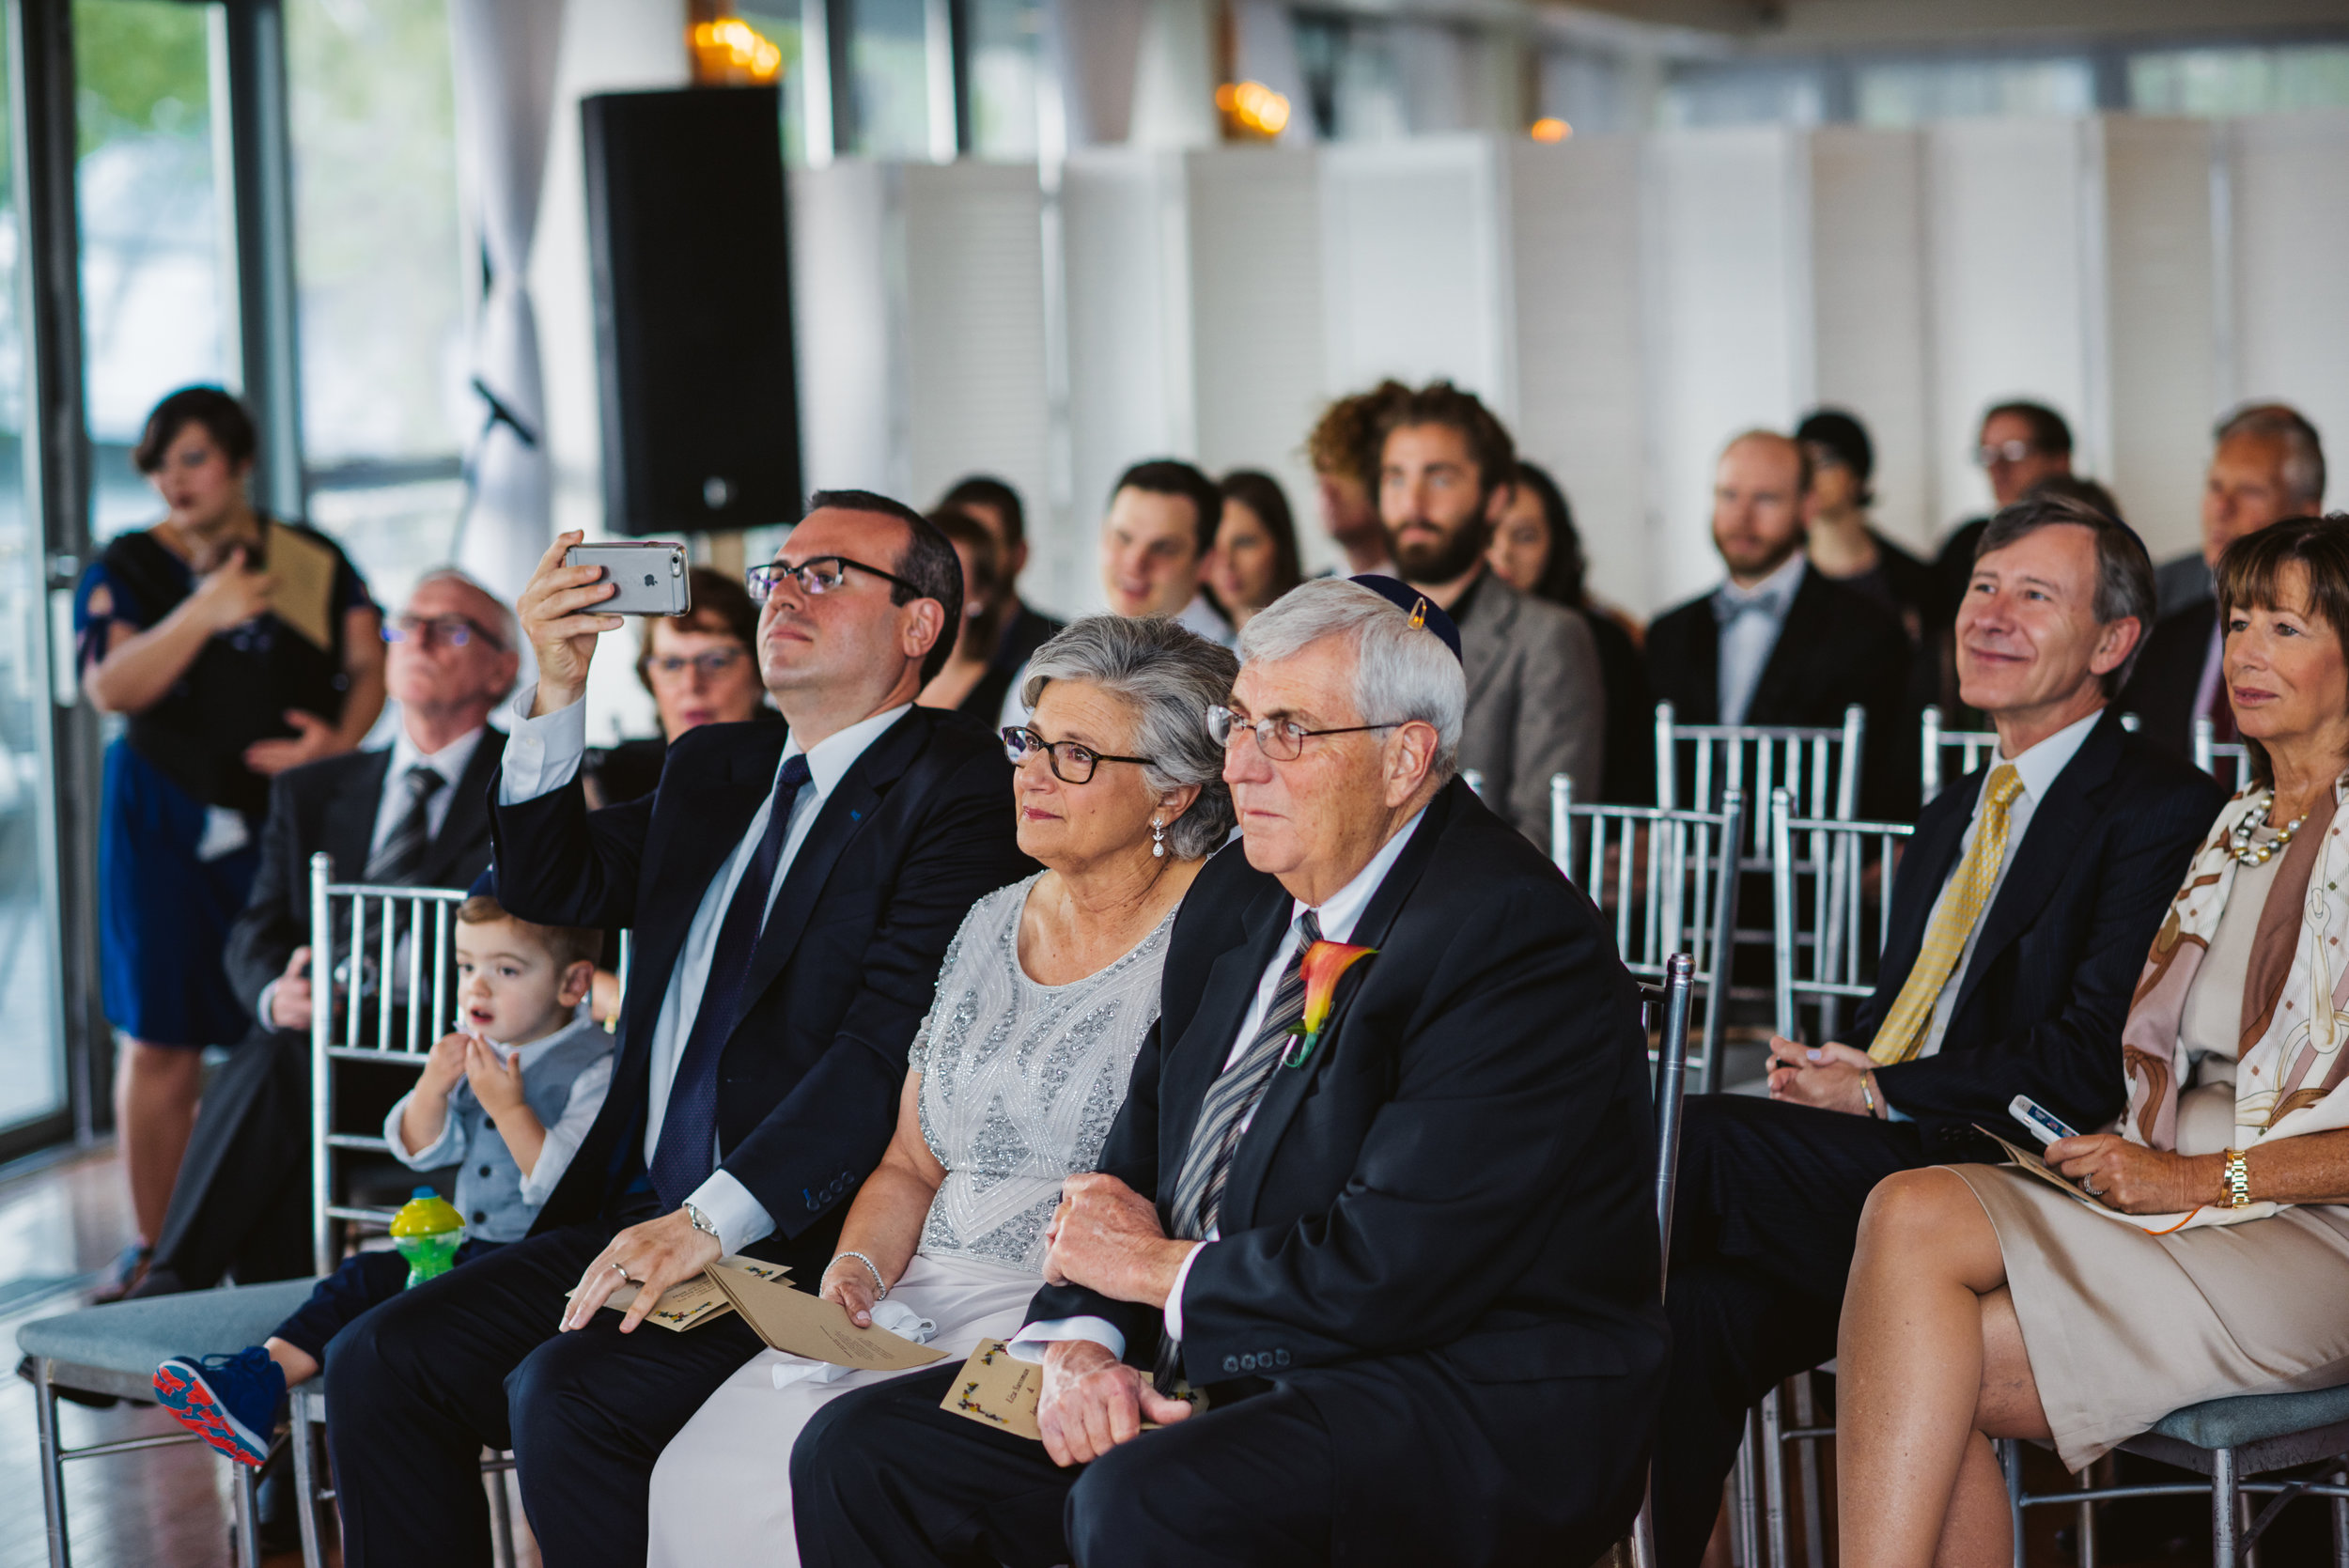 LIZA & JON - BATTERY PARK WEDDING - NYC INTIMATE WEDDING PHOTOGRAPHER - CHI-CHI AGBIM-401.jpg